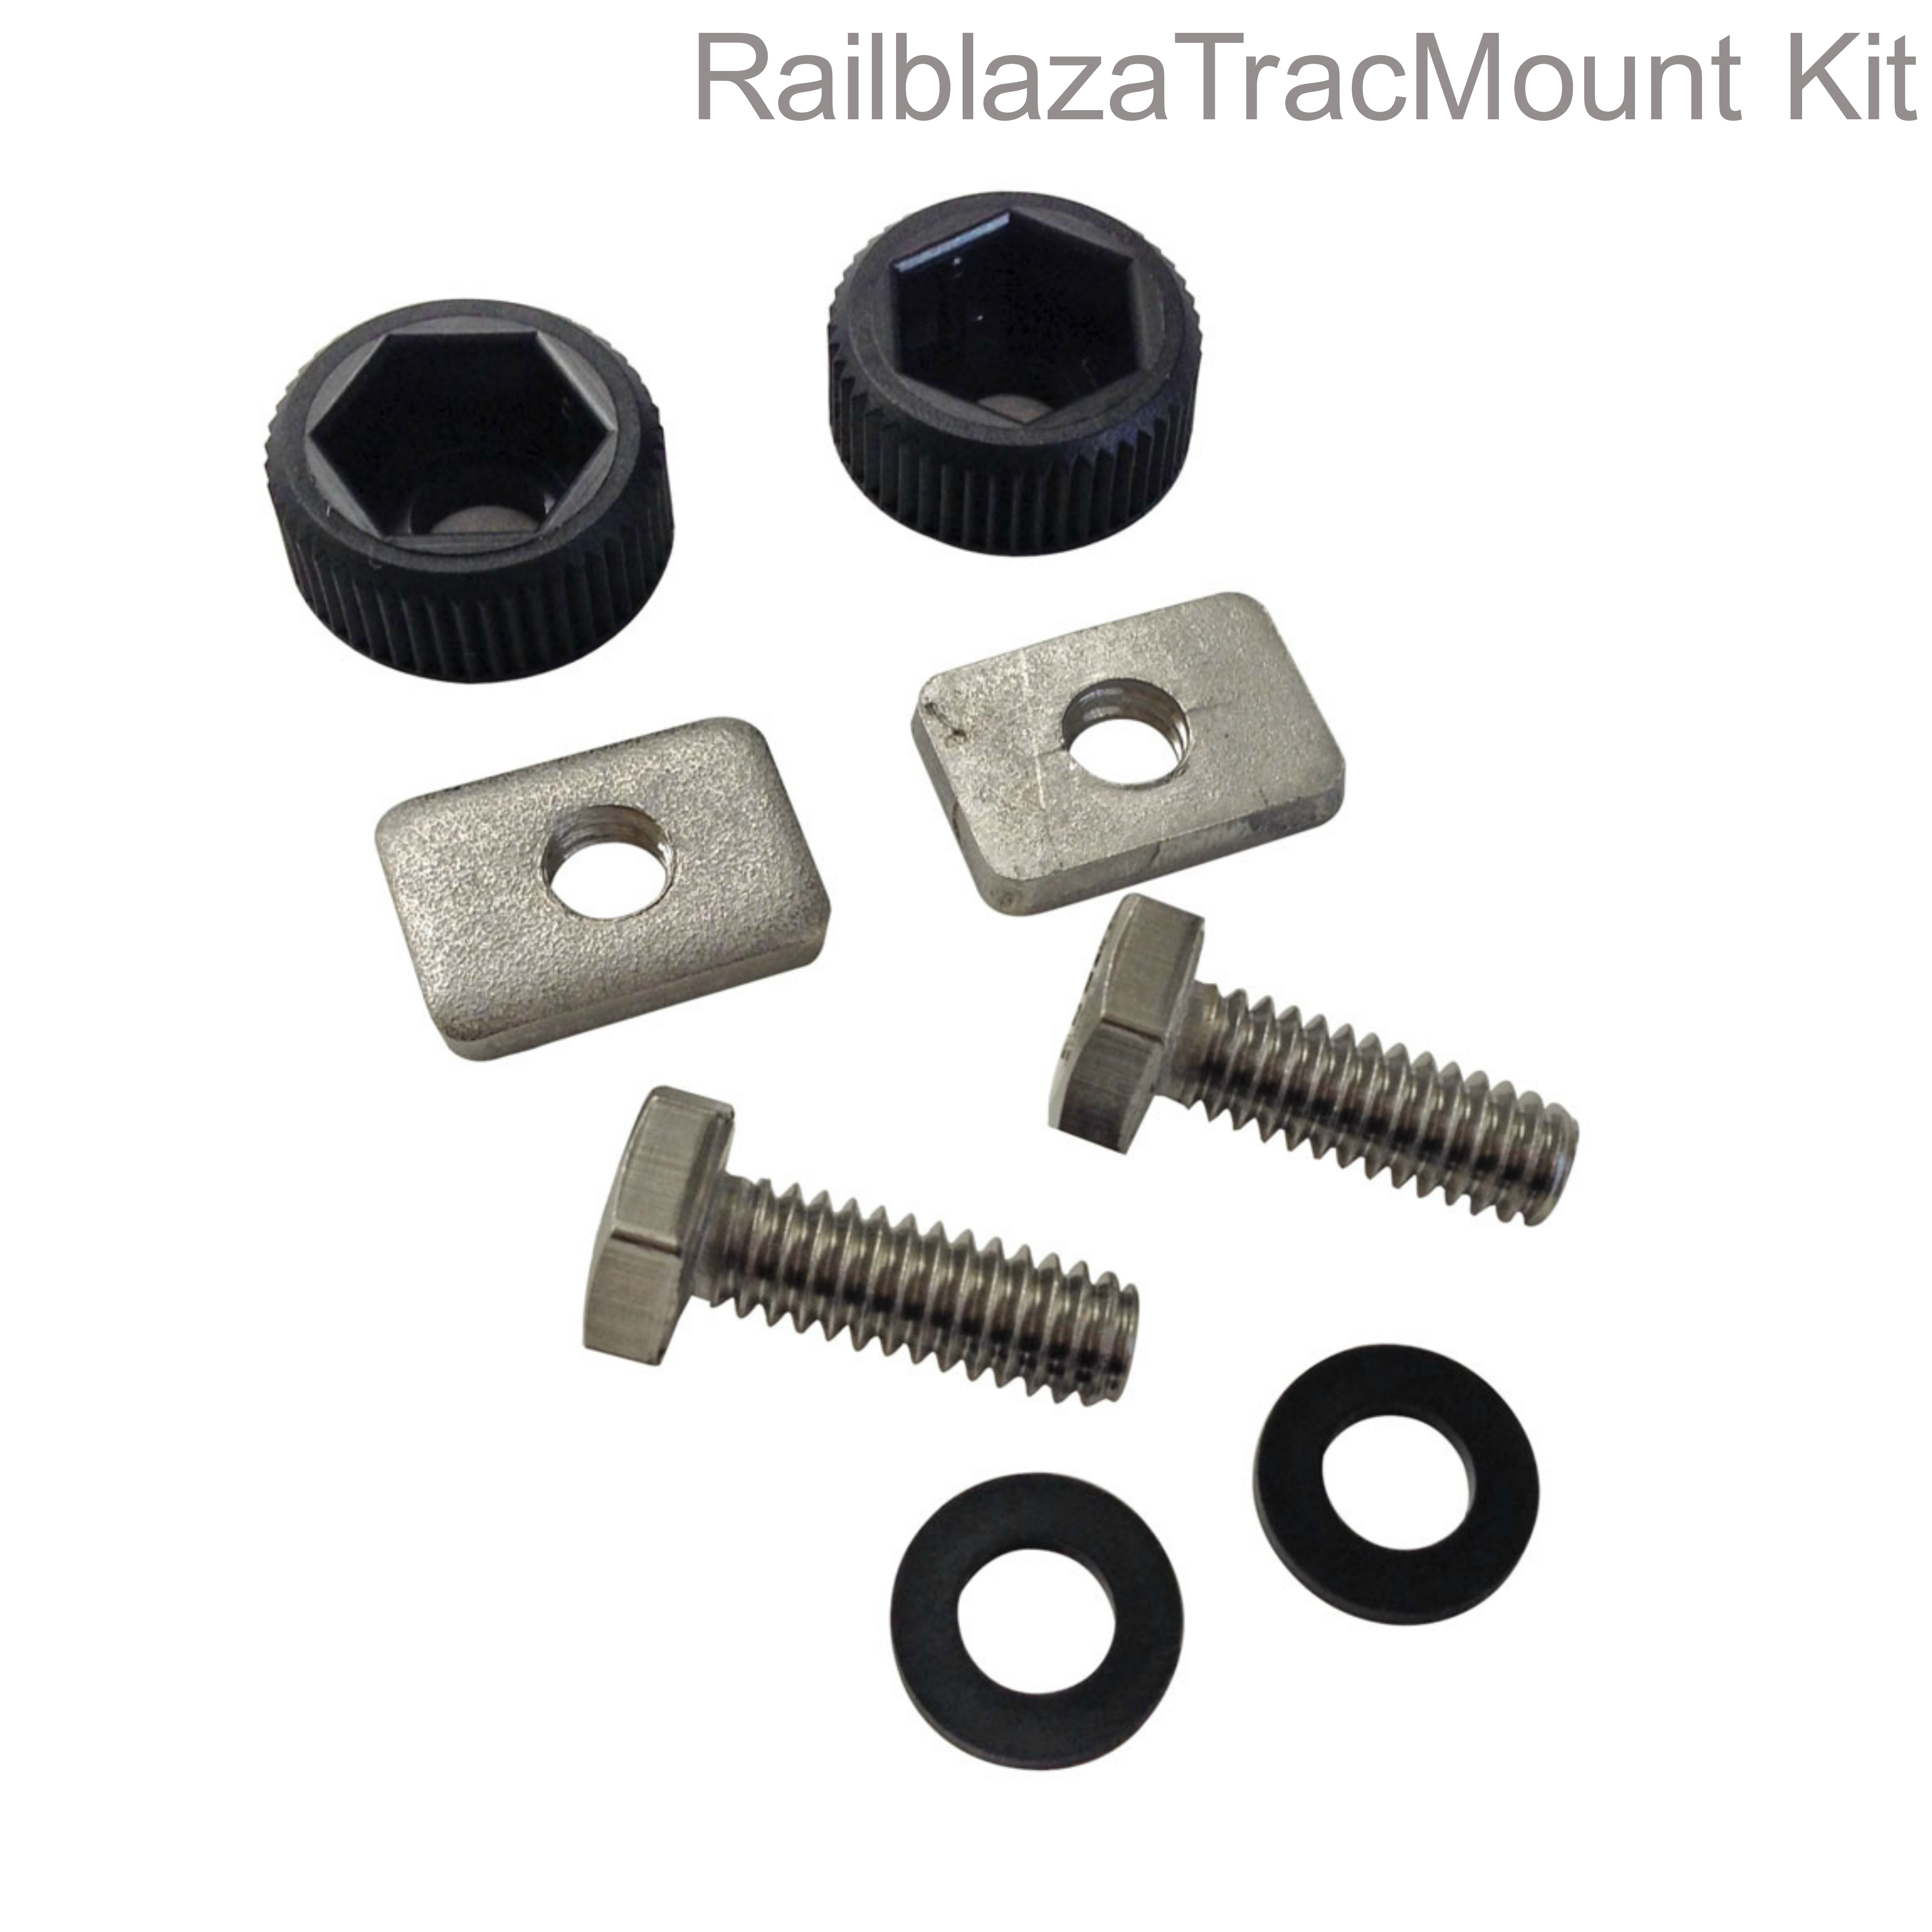 Railblaza 03-4109-11 StarPort HD TracMount Kit|Centrally Lock|For Kayak Accessory